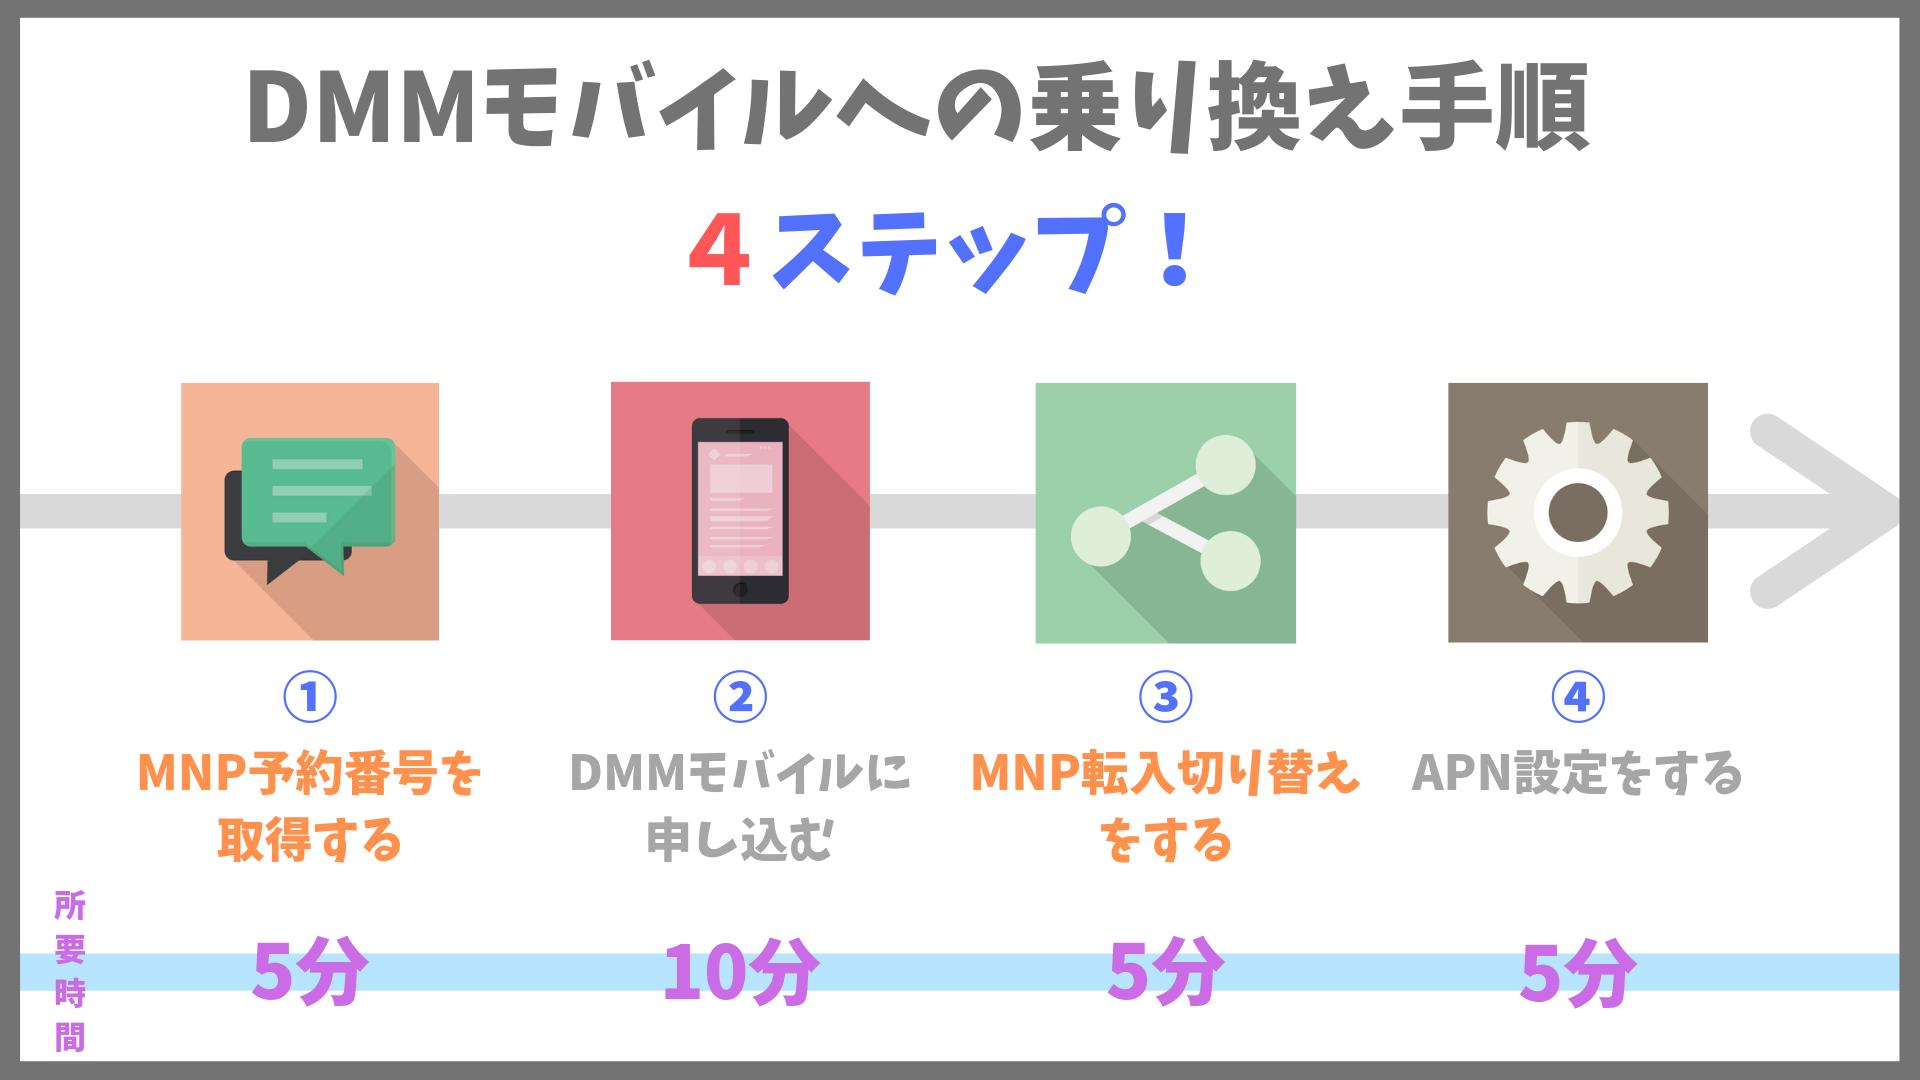 DMMモバイル 乗り換え方法